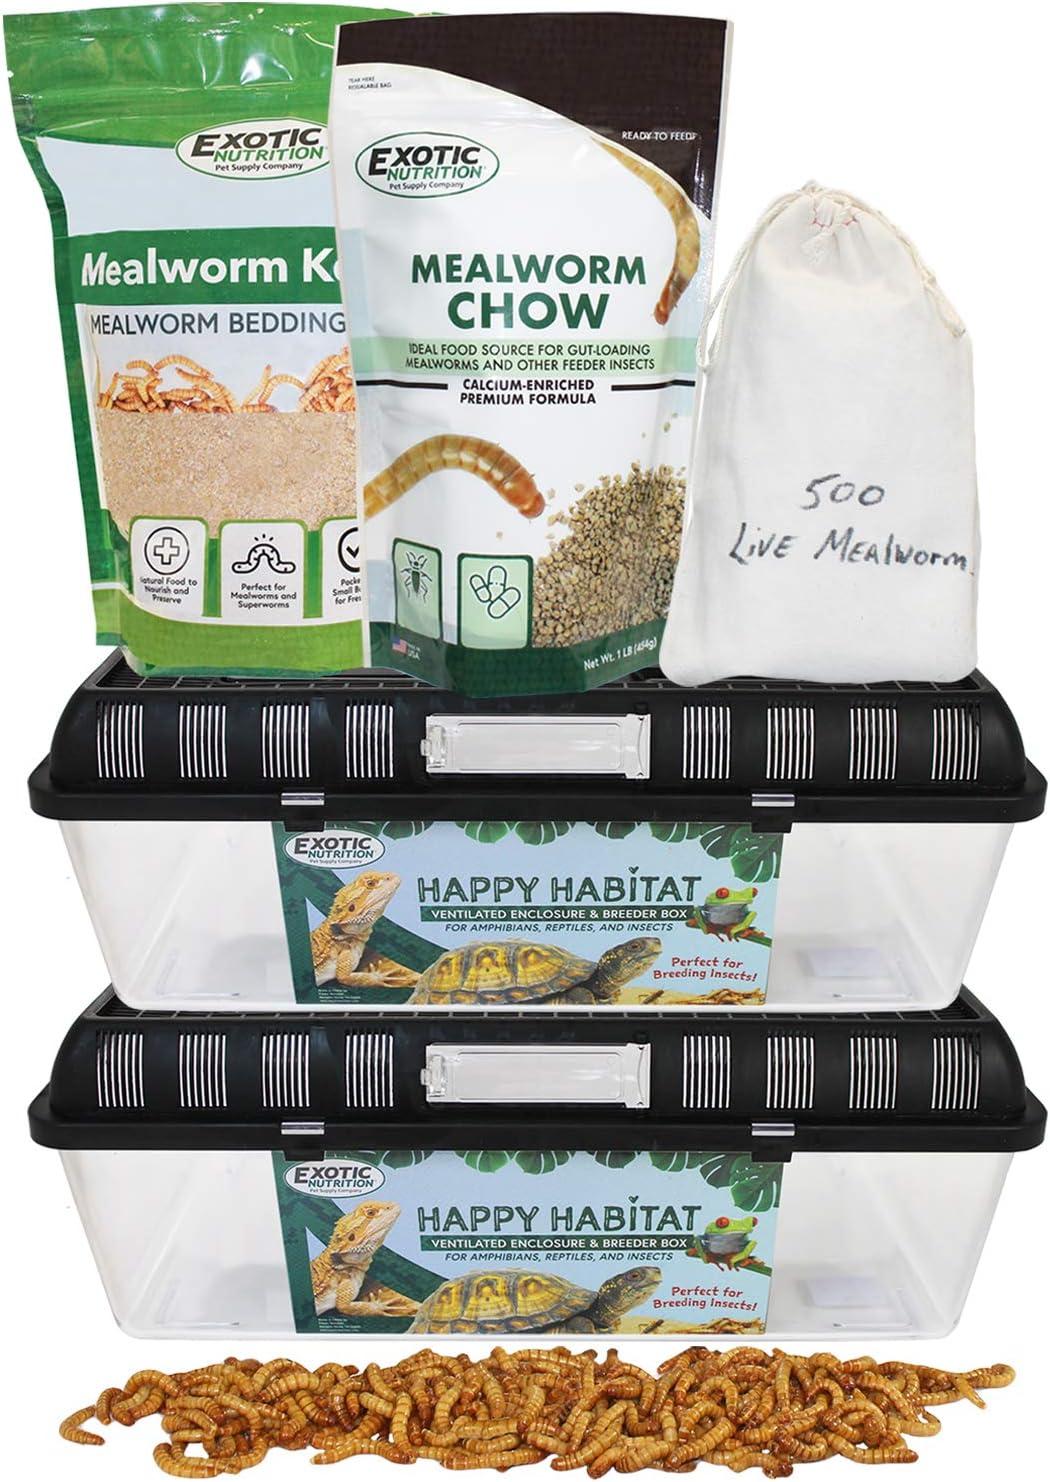 Mealworm Breeder Kit - Breed Live Feeder Worms for Hedgehogs, Sugar Gliders, Reptiles, Wild Birds, Chickens, Lizards, Bearded Dragon, Skunks, Opossum, Fish, Turtles, Tortoises, Geckos